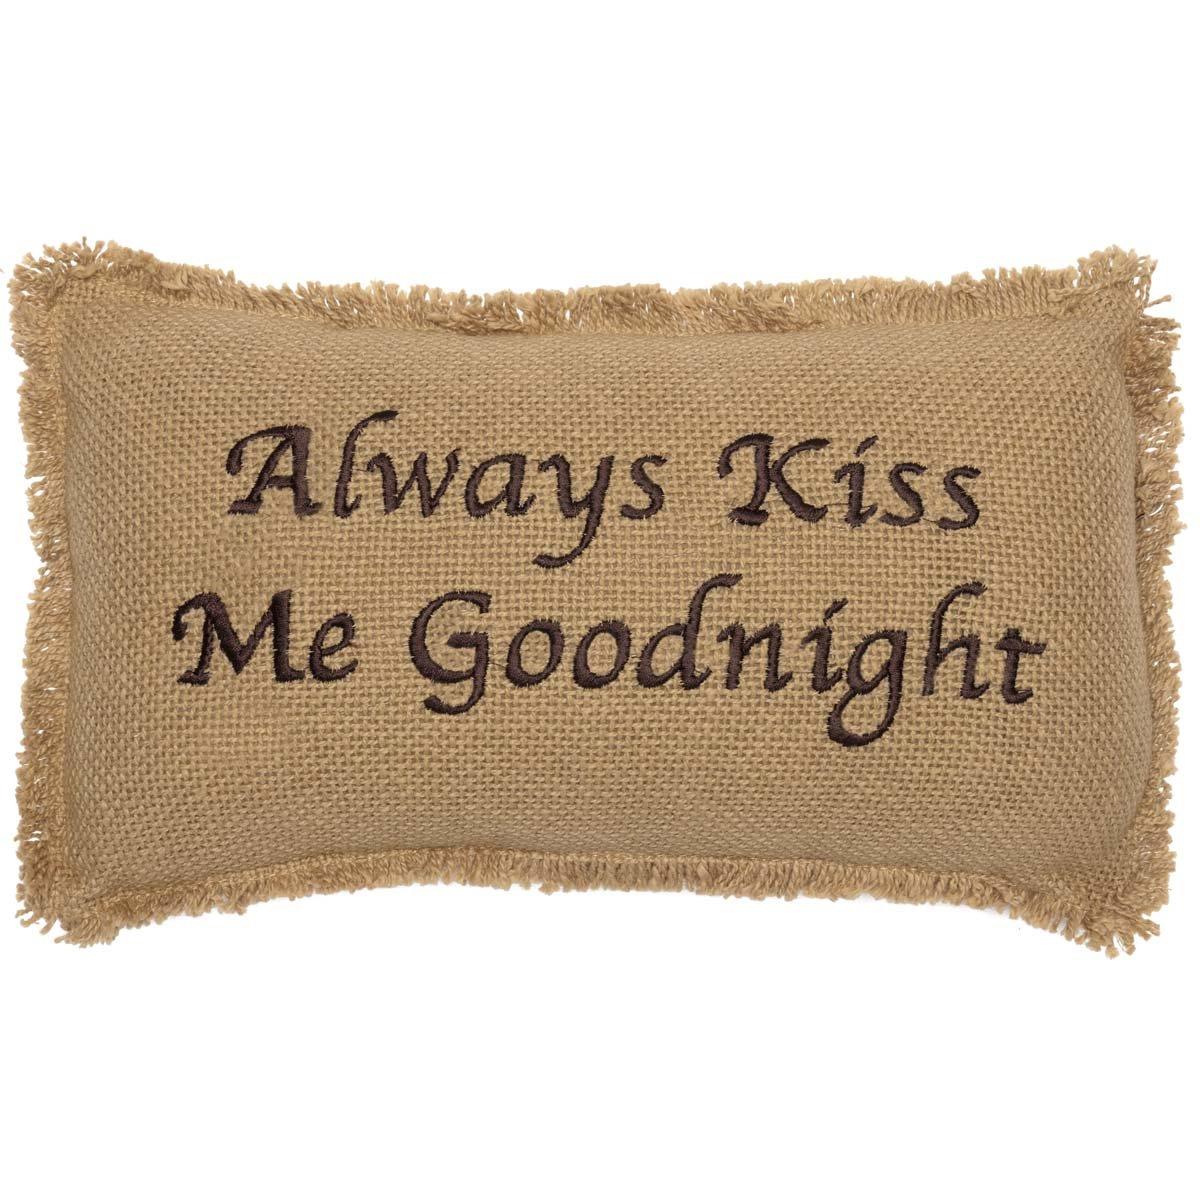 VHC Brands 6166 Burlap Natural Always Kiss Me Goodnight 7 x 13 Pillow